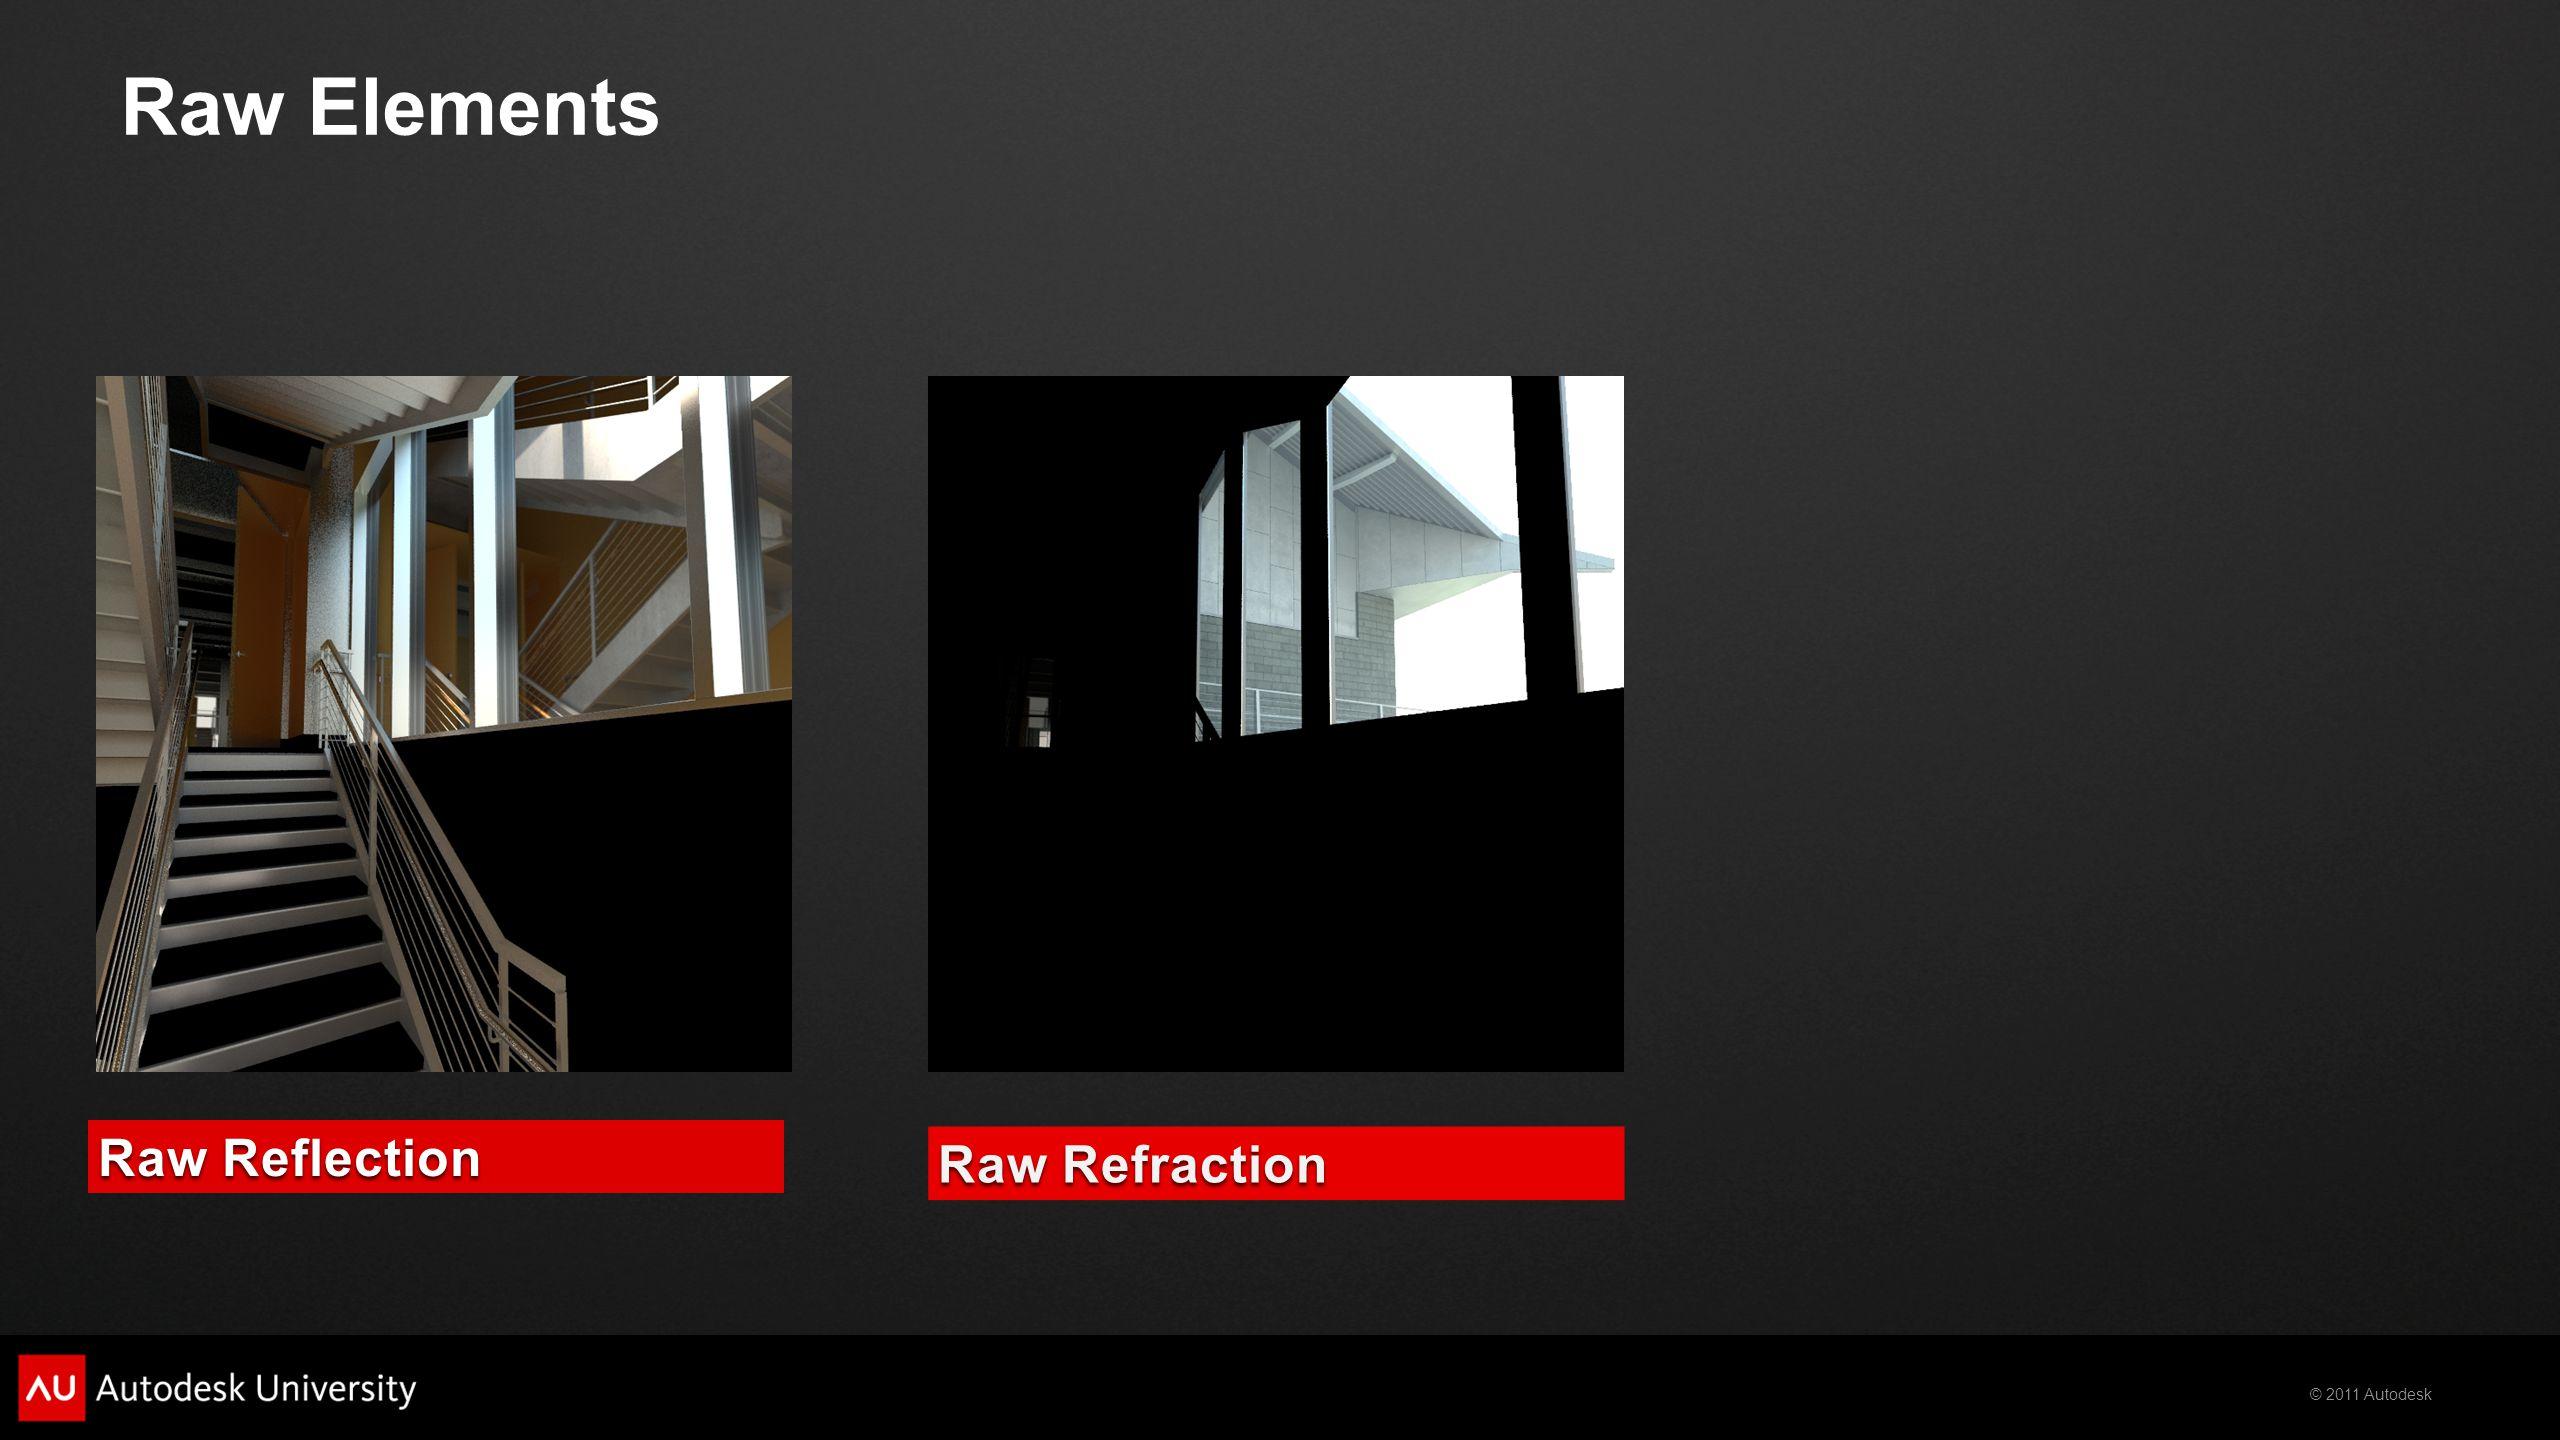 © 2011 Autodesk Background CompositionLighting Global Illumination Reflection Refraction Specular Self Illumination Beauty